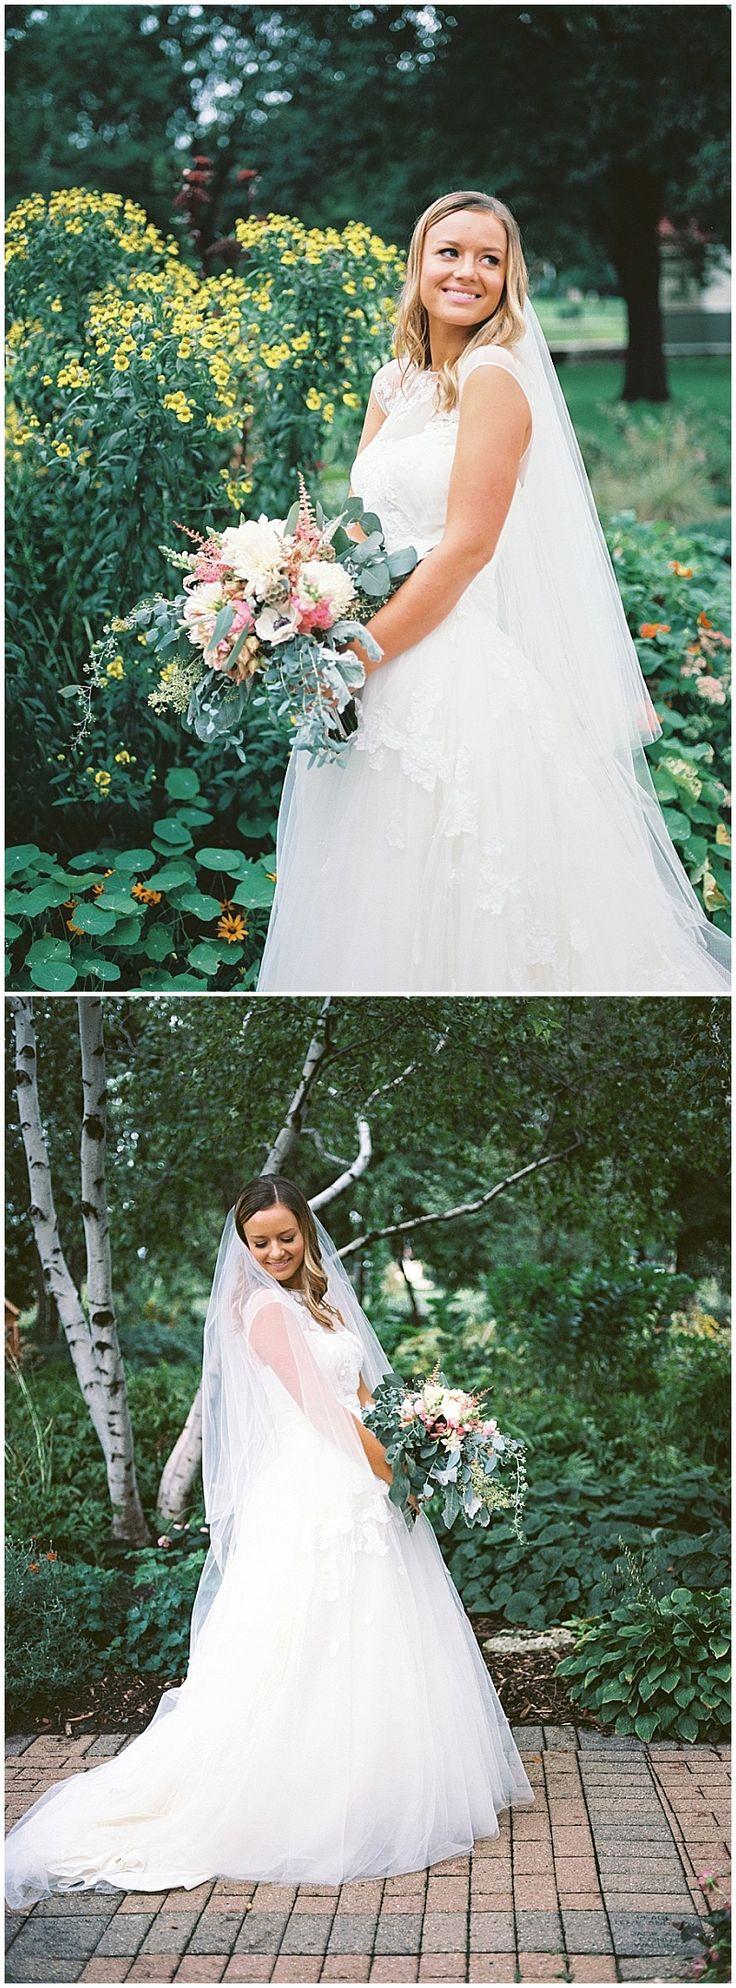 Inside the bouquet: Blush ranunculus, anemones, silver brunia, dahlias, blush astilbi, guinea eucalyptus, silver dollar eucalyptus, dusty miller, scabiosa, snapdragons, seeded eucalyptus, white freesia, protea, and white Veronicas. Floral designed by Minneapolis wedding florist Artemisia Studios. Photos by @marcandreophoto #dayblockeventcenter #bride #bridalbouquet #Bouquet #flowers #floral #florist #summerwedding #weddingflowers #minneapolisweddingflorist #artemisiastudios